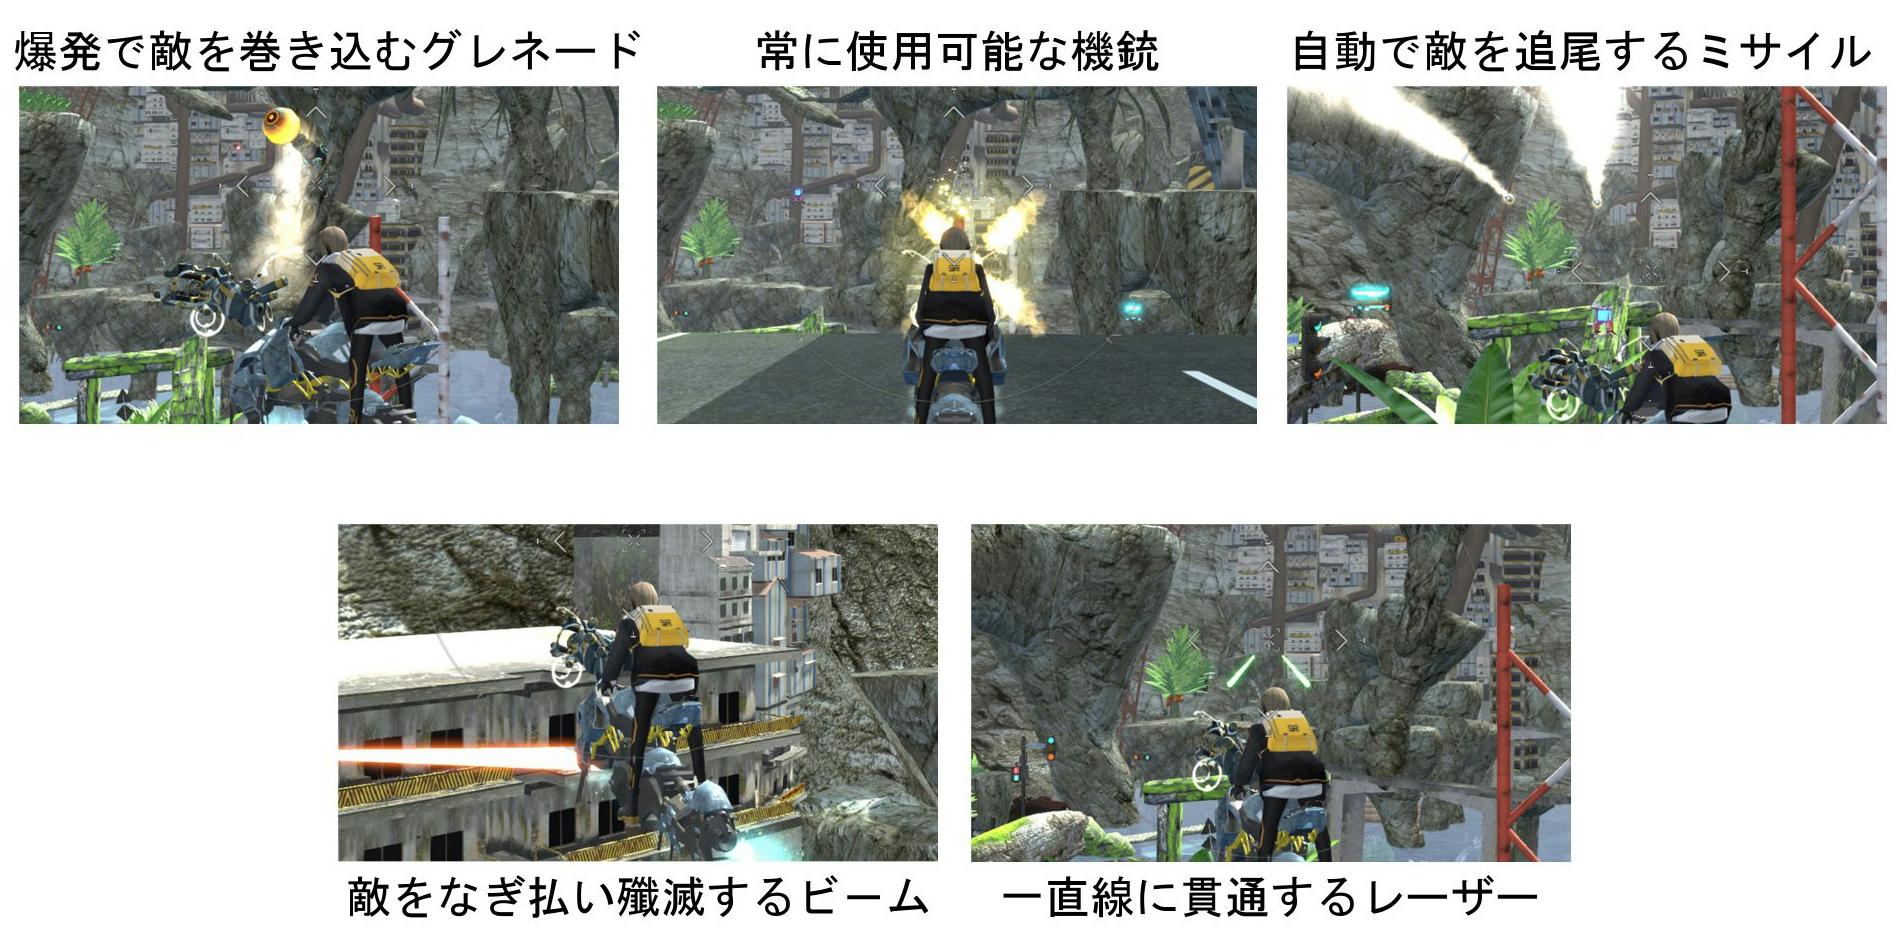 Nintendo Switch用ソフト『Sky Ride』が2017年8月24日から配信開始!